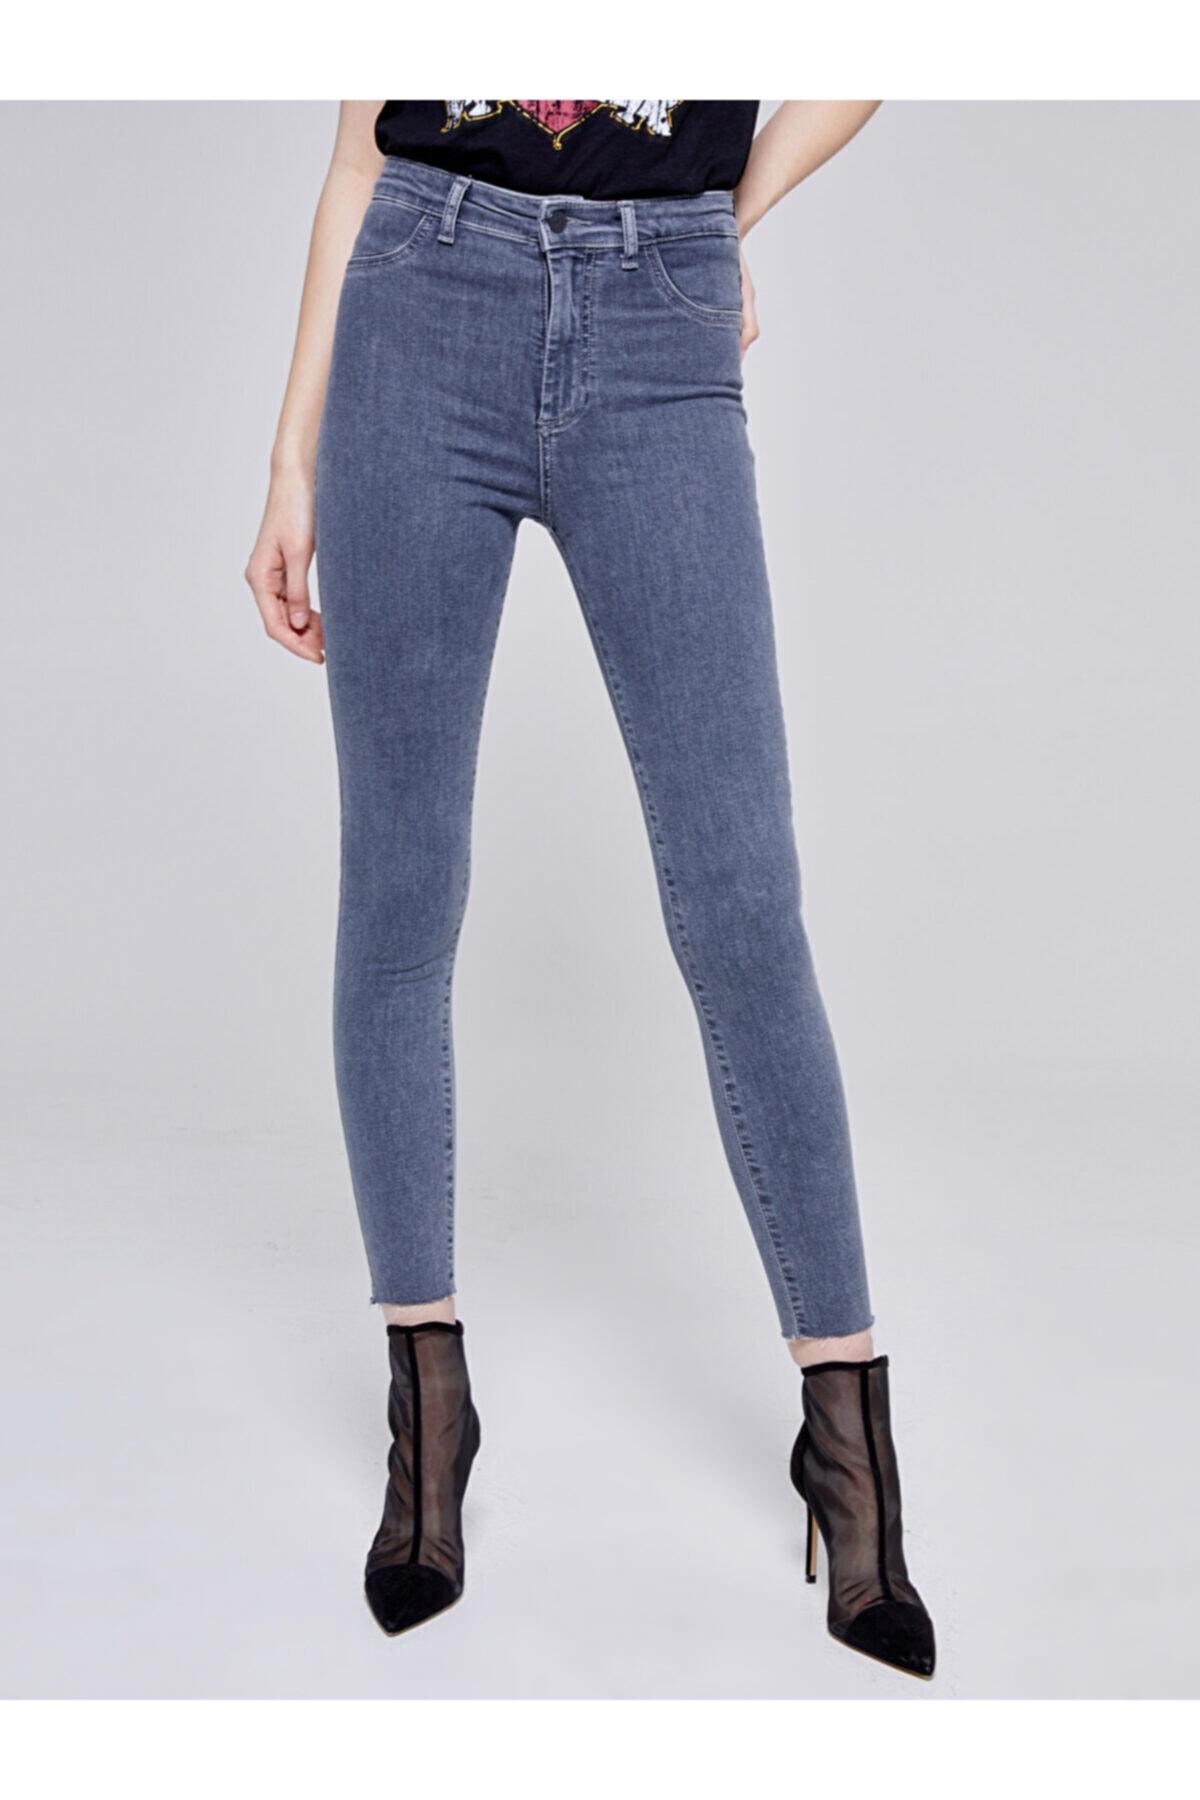 Marınella X Mıera Wash Pantolon